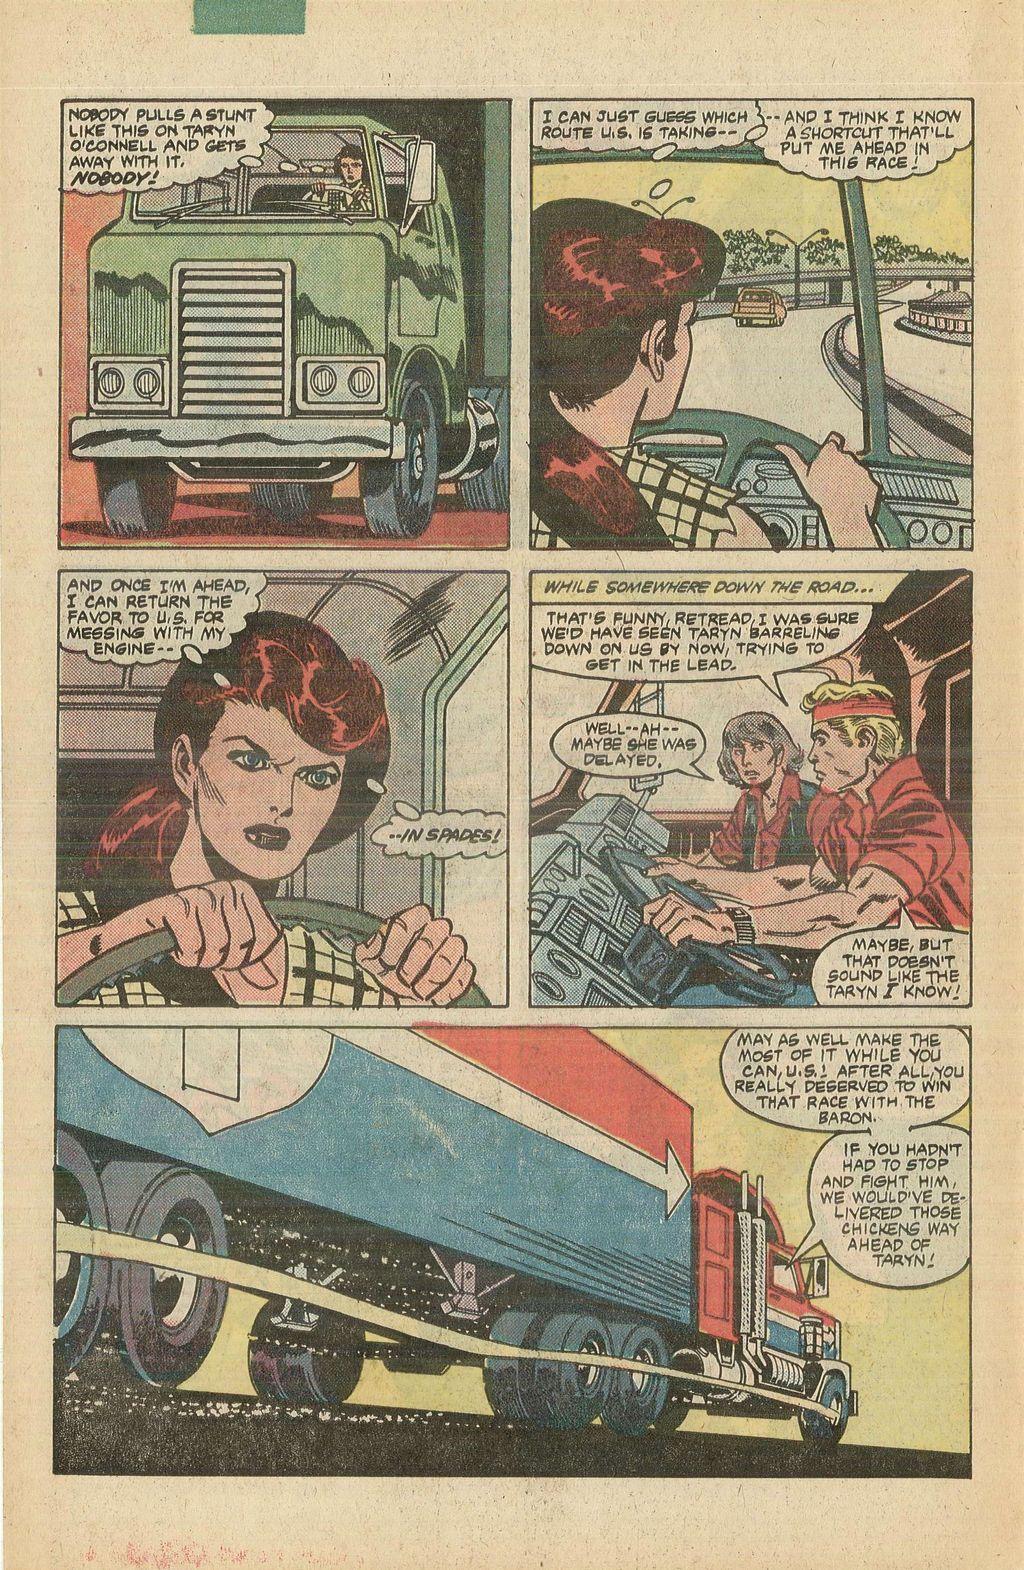 Read online U.S. 1 comic -  Issue #5 - 10